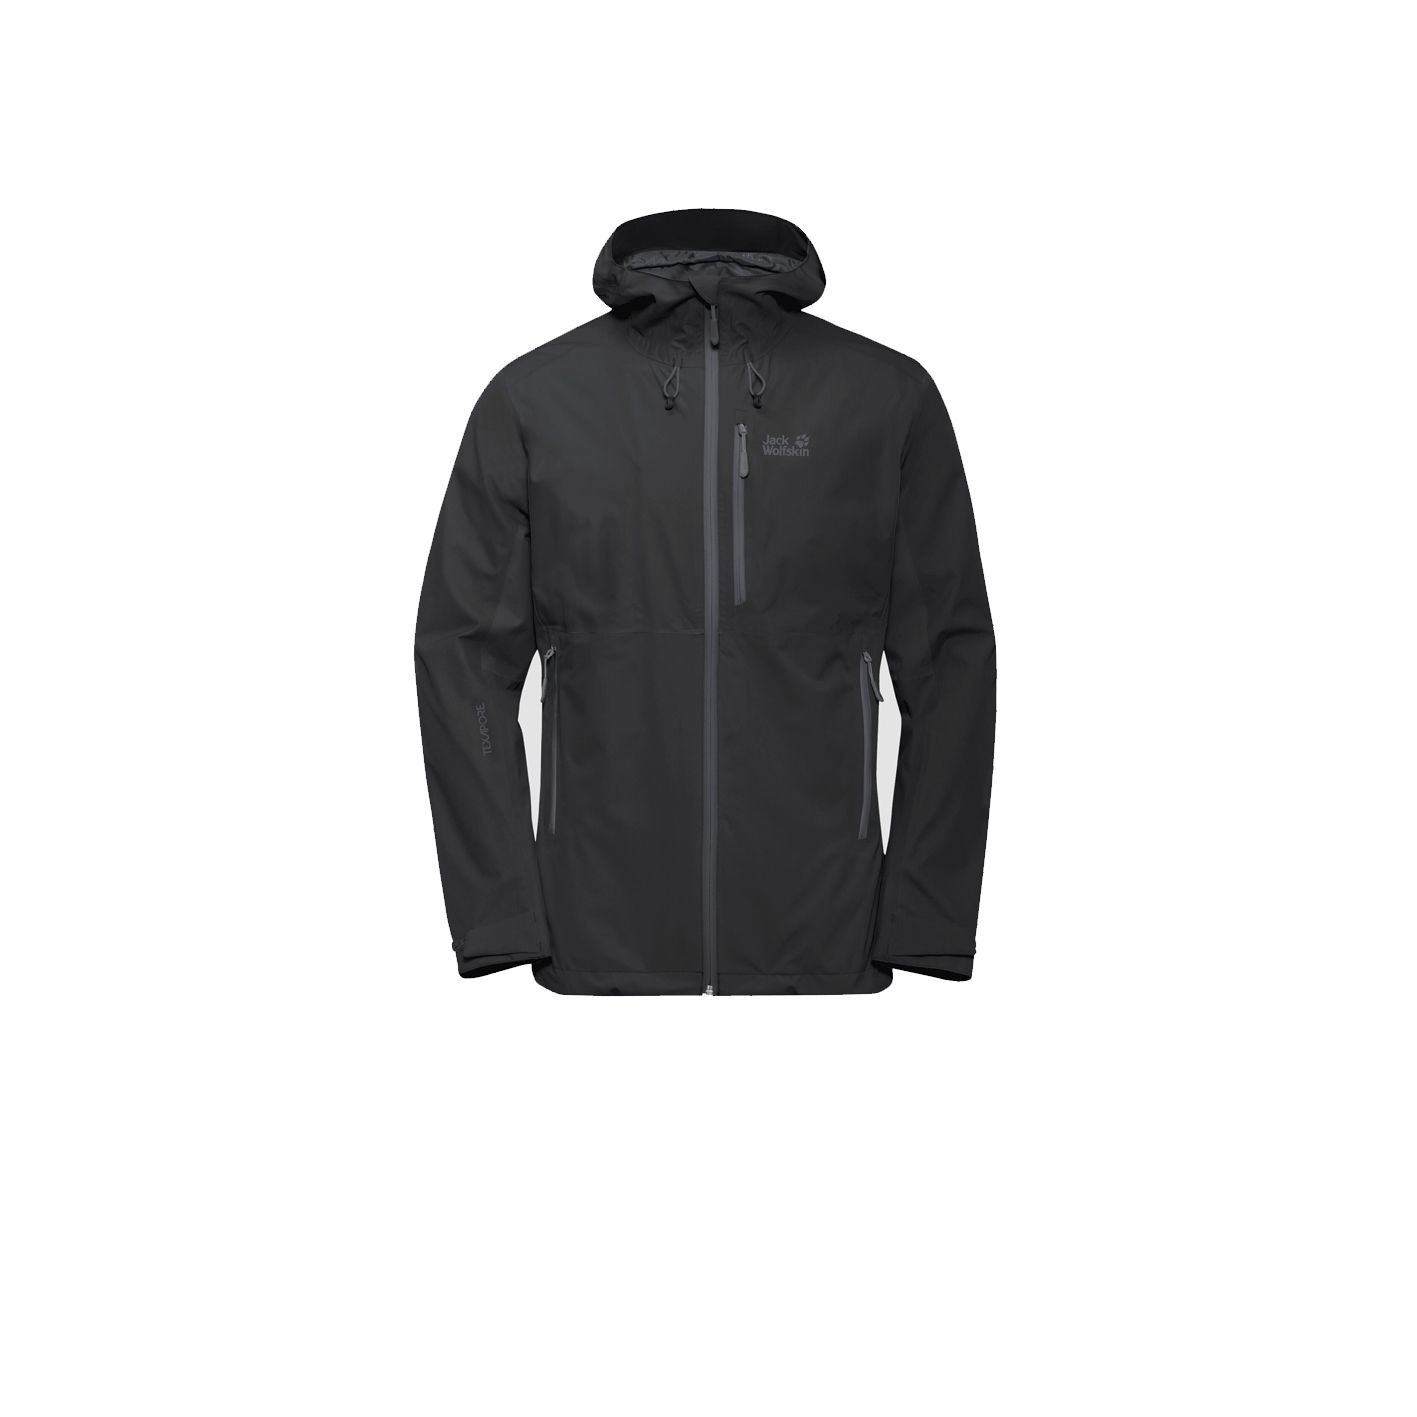 best waterproof windproof jacket mens